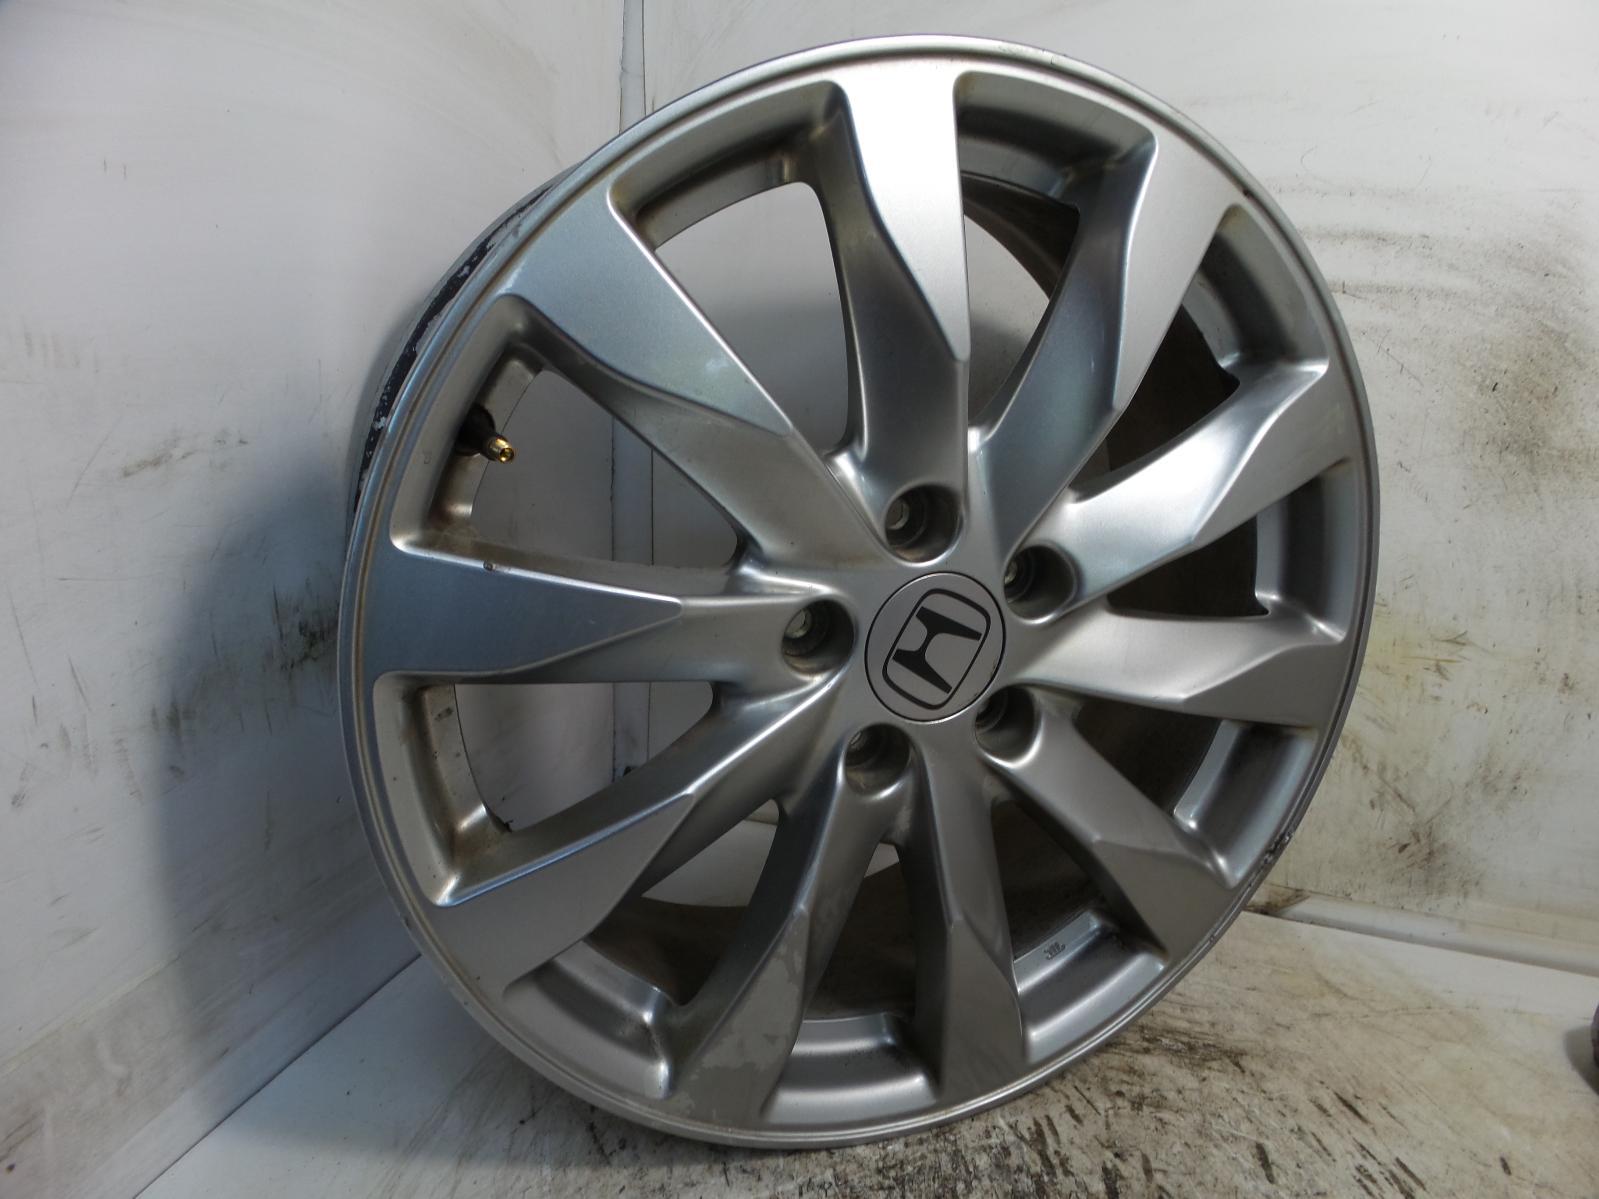 2010 honda crv alloy wheel 5 stud 10 spoke design 7j x 18 inch et50 ebay. Black Bedroom Furniture Sets. Home Design Ideas